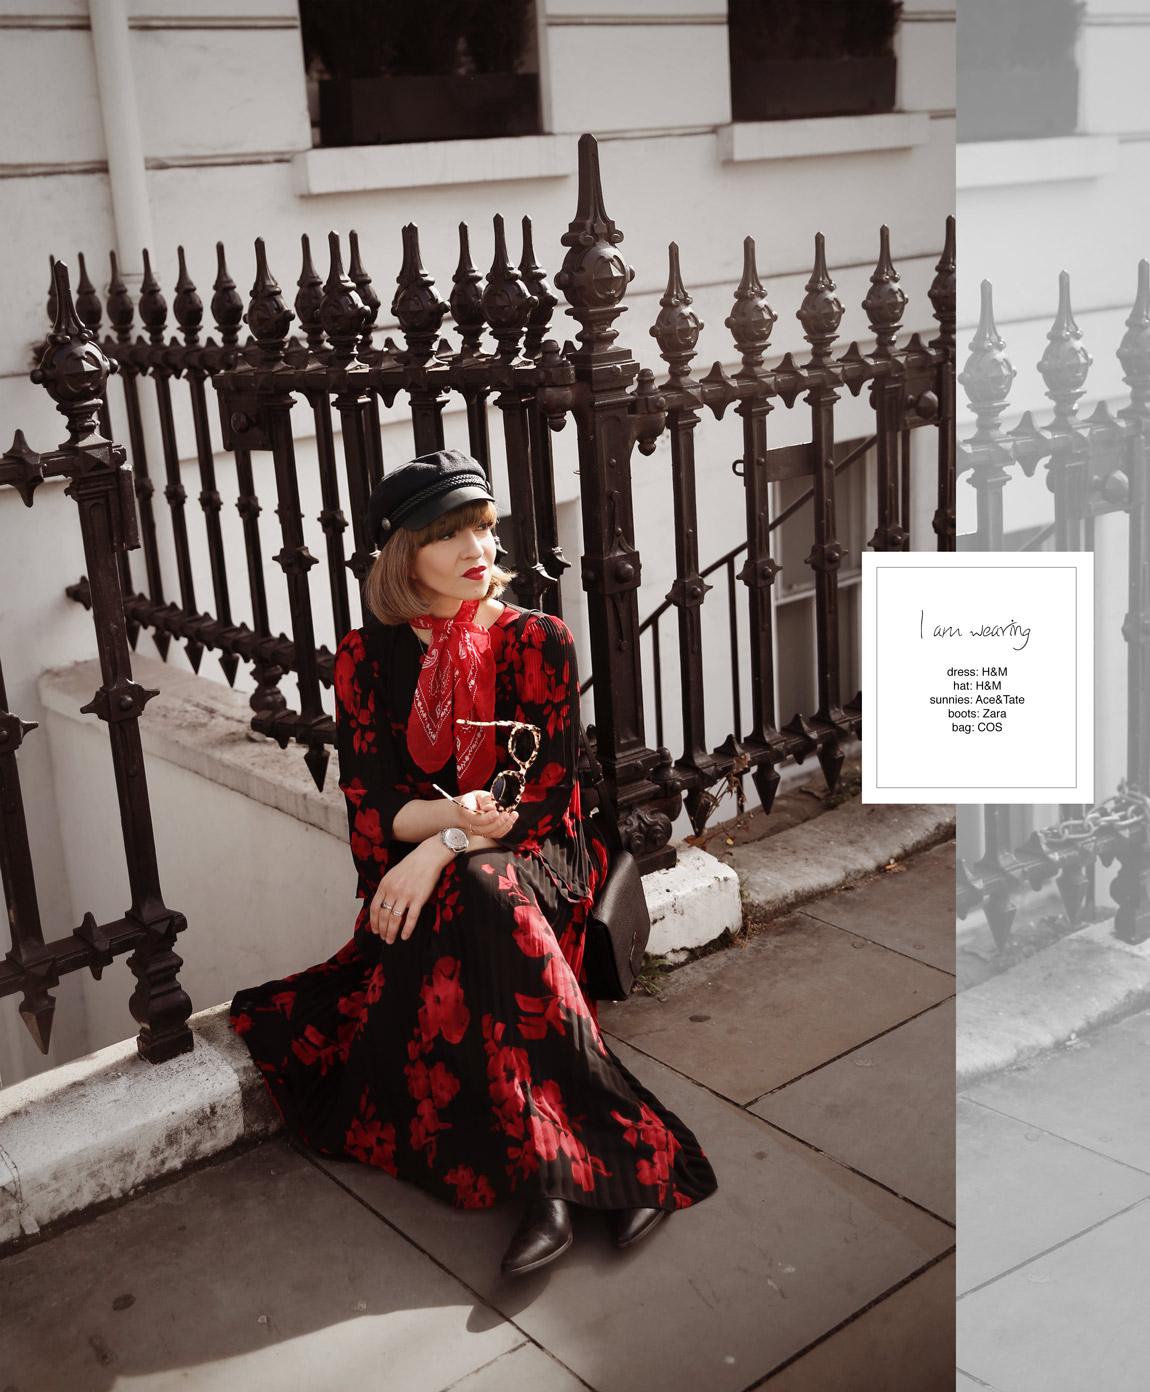 london, hm, kleid, dress, greatbritain, fashion, streetstyle, look, outift, fashionblog, modeblogger, muenchen